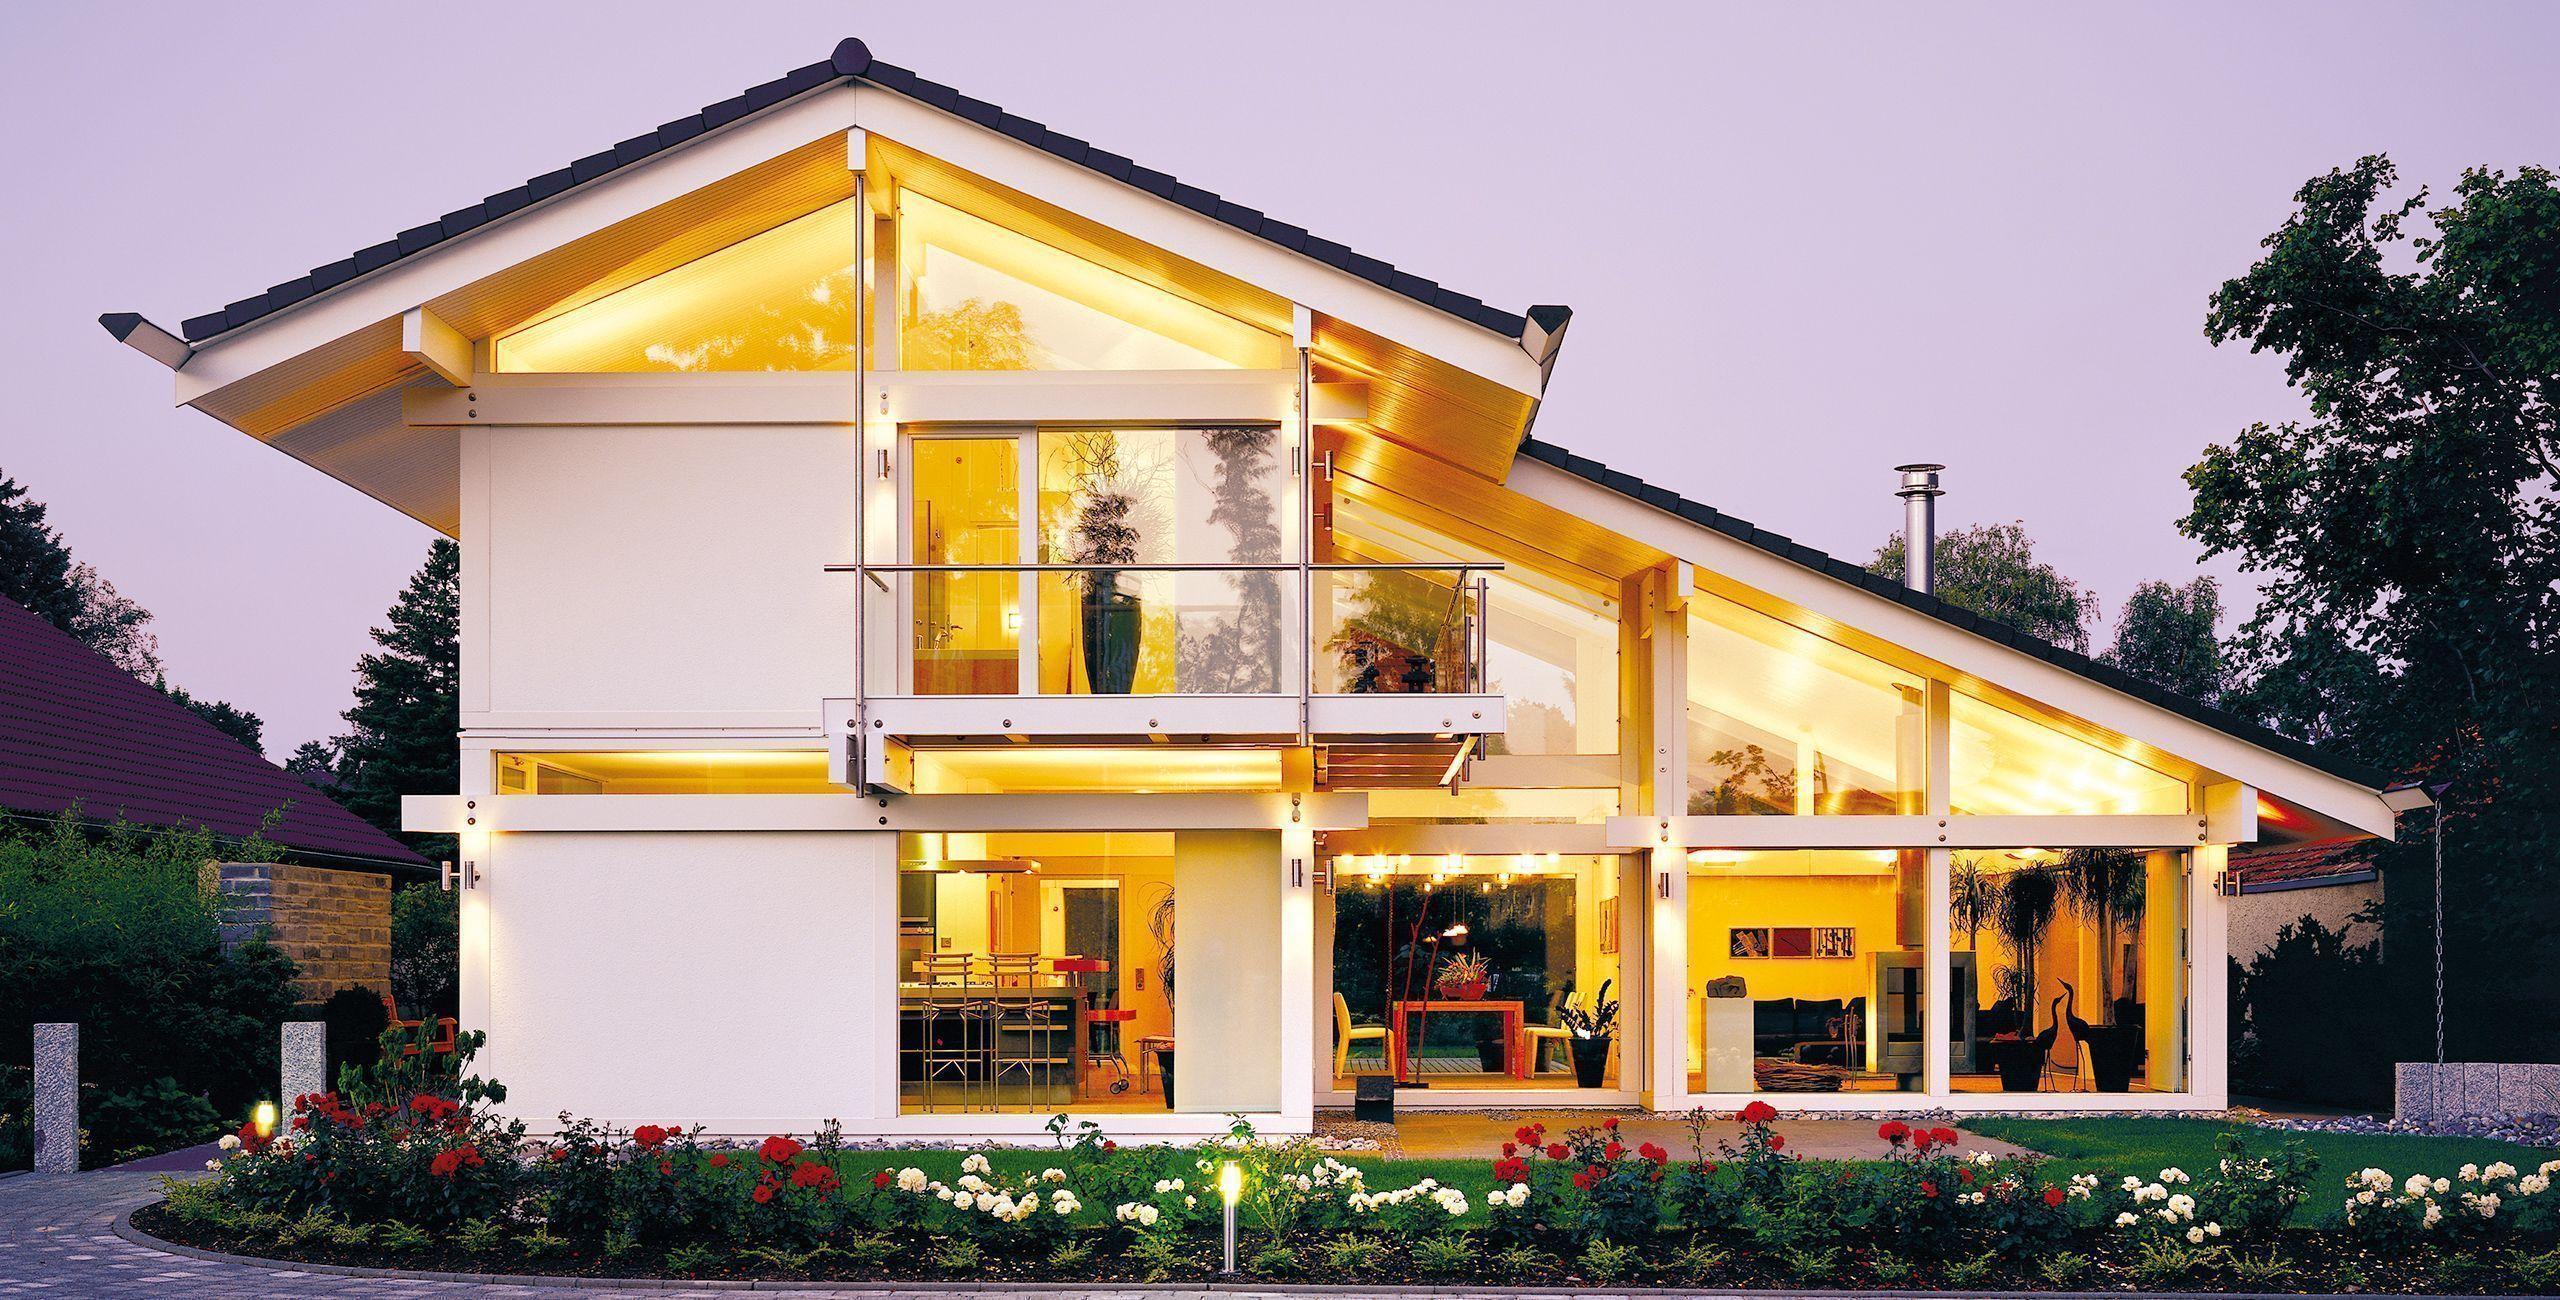 fertighaus im musterhauspark berlin haus bauen mit huf haus huf haus. Black Bedroom Furniture Sets. Home Design Ideas